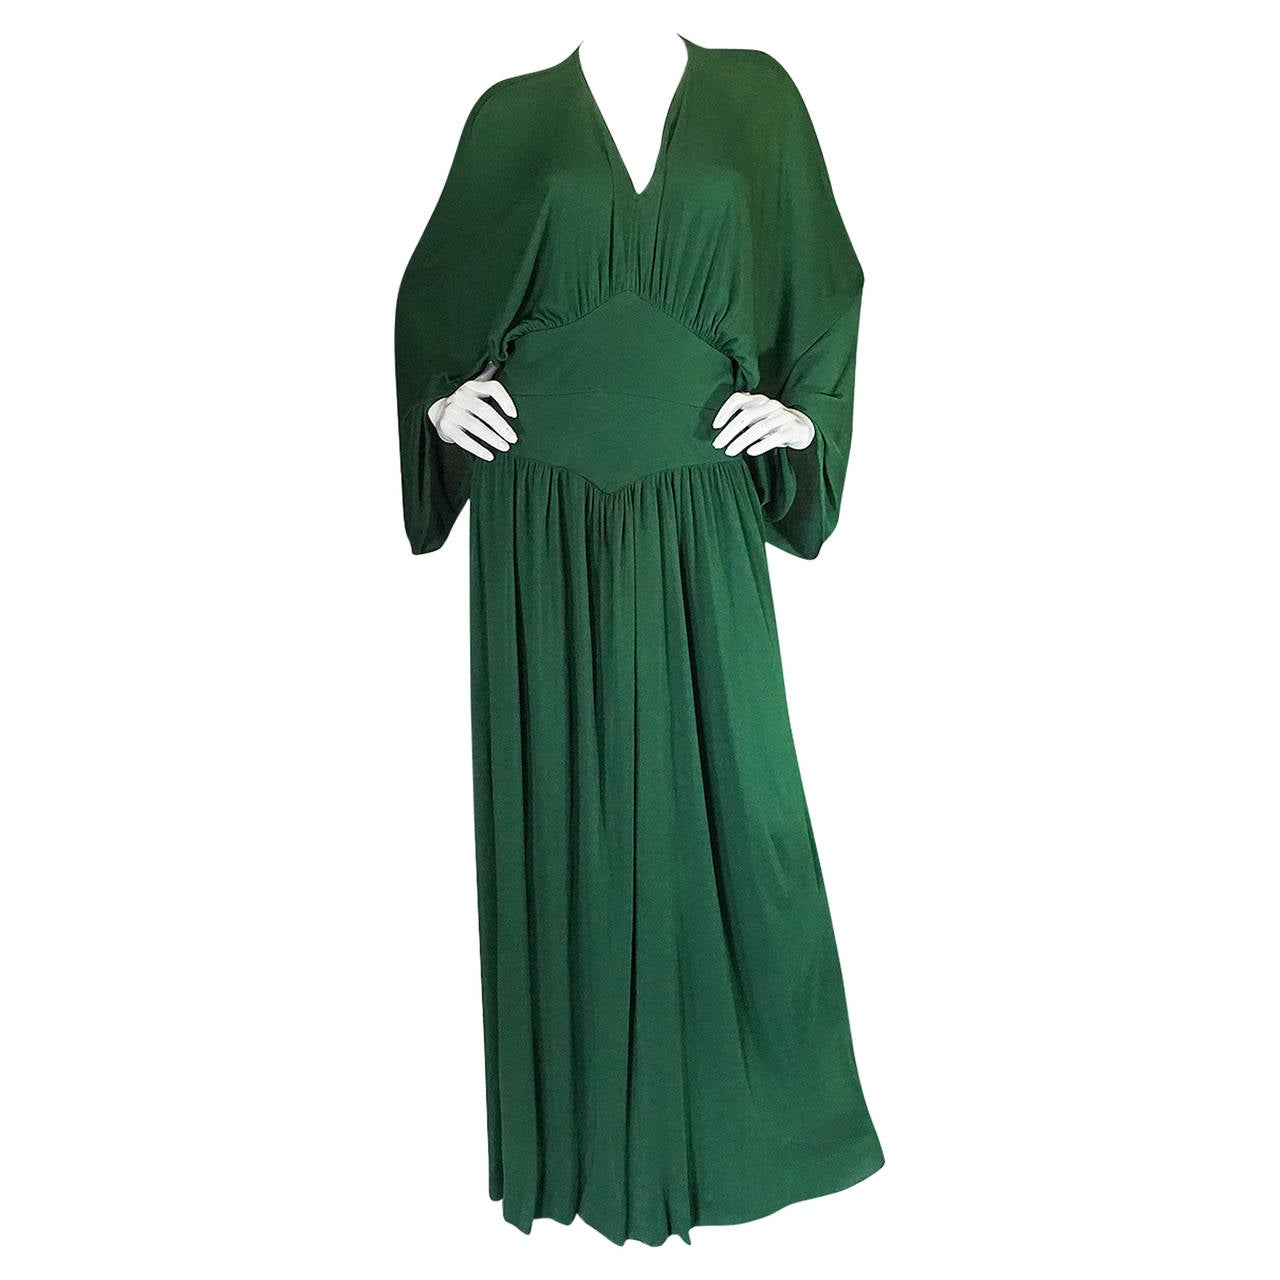 1960s Jean Patou Demi-Couture Green Jersey Caftan Dress 1